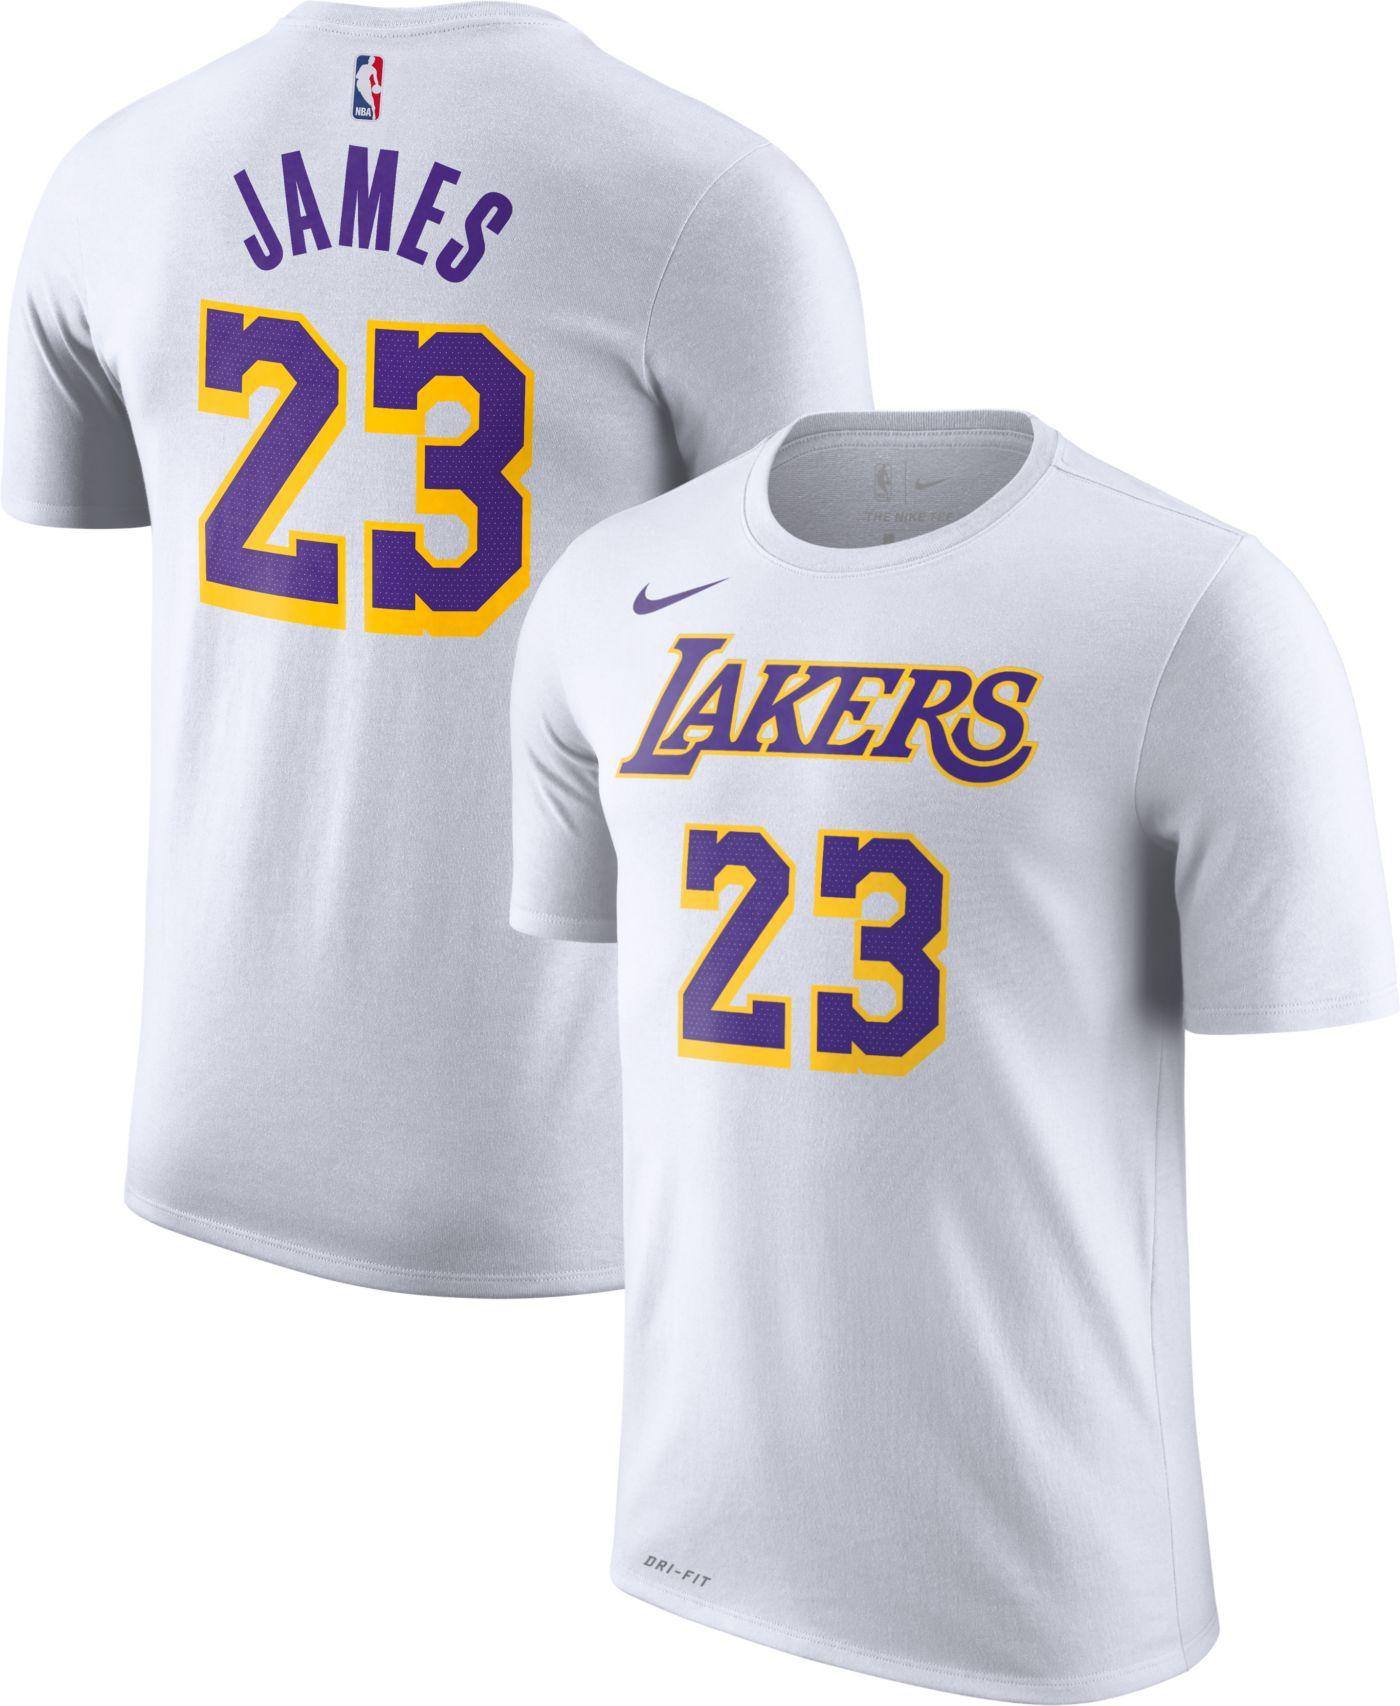 Nike Youth Los Angeles Lakers LeBron James Dri-FIT White T-Shirt